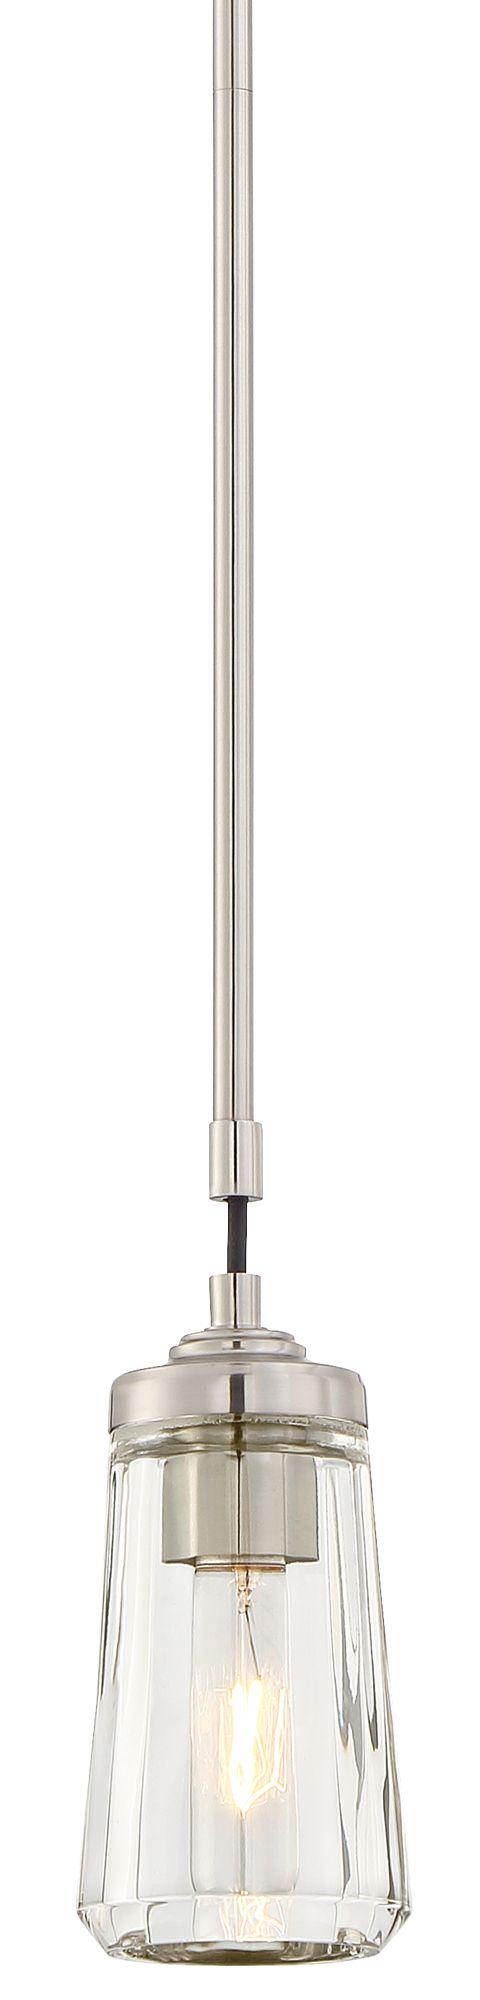 Poleis 3 3/4  Wide Brushed Nickel Mini Pendant Light  sc 1 st  L&s Plus & Poleis 3 3/4